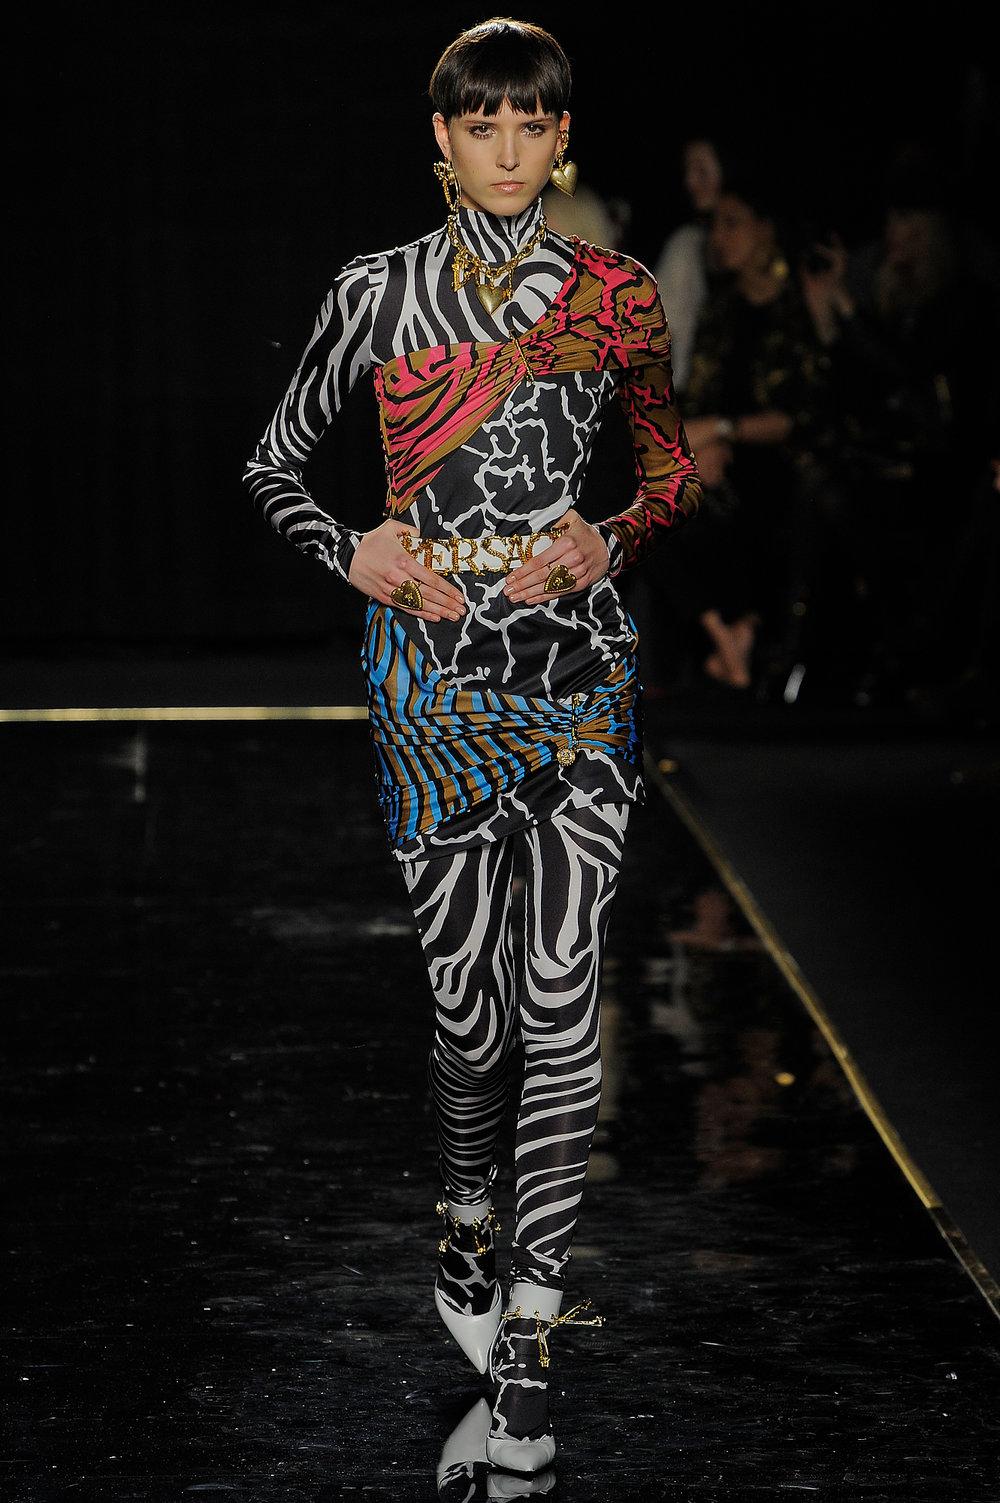 Versace_28_dc_versace_runway_runway_00028.jpg